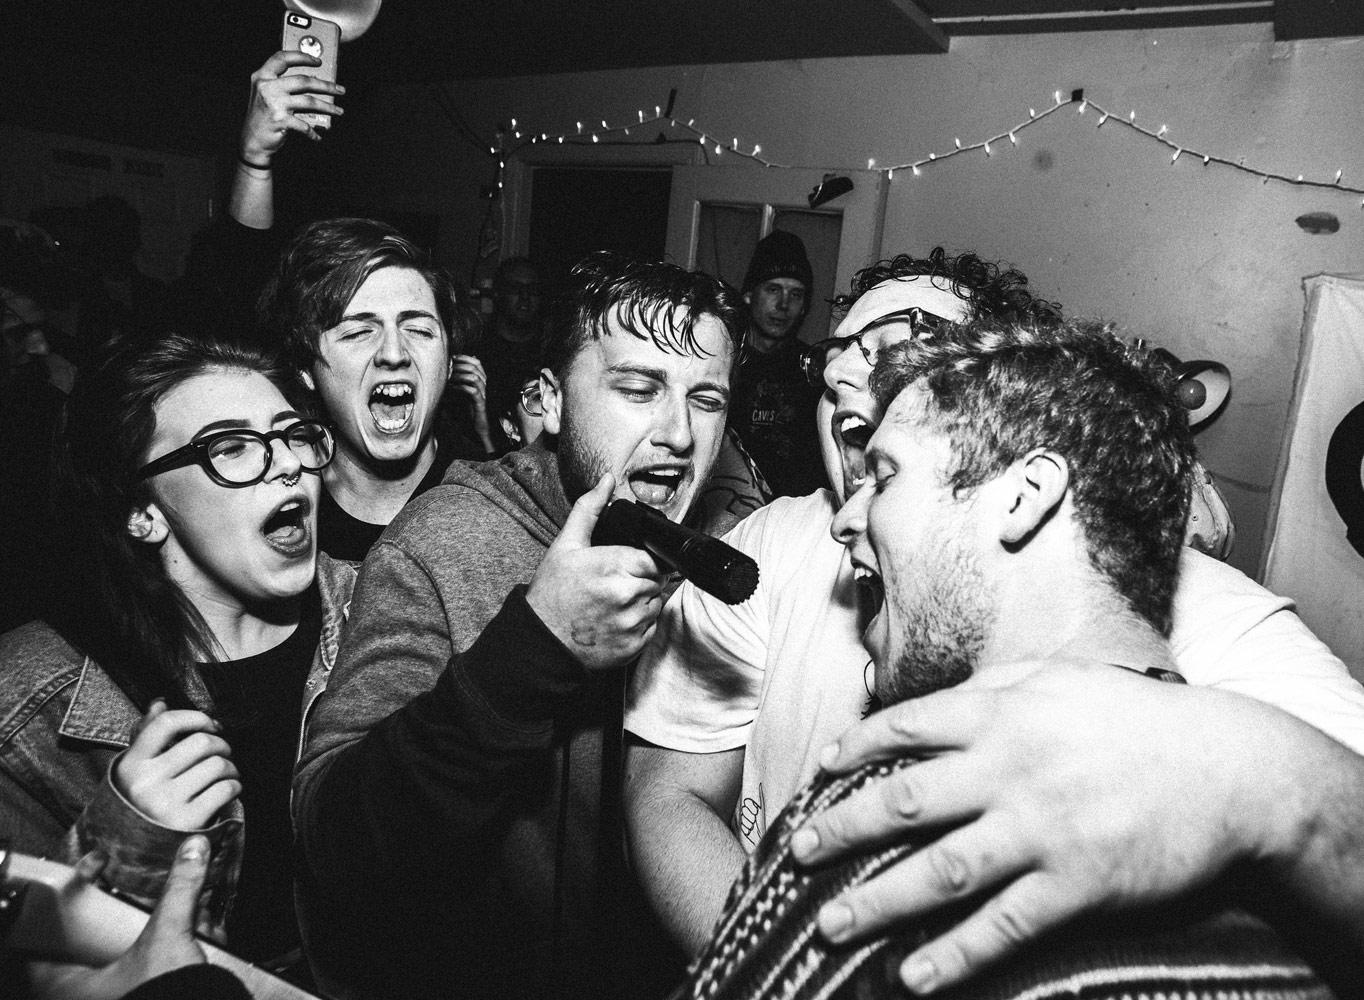 «Банда певцов», © Майк Чикетти / Mike Cicchetti, Порт Вашингтон, США, Финалист категории «Любитель : Толпа», Фотоконкурс «Момент музыки»